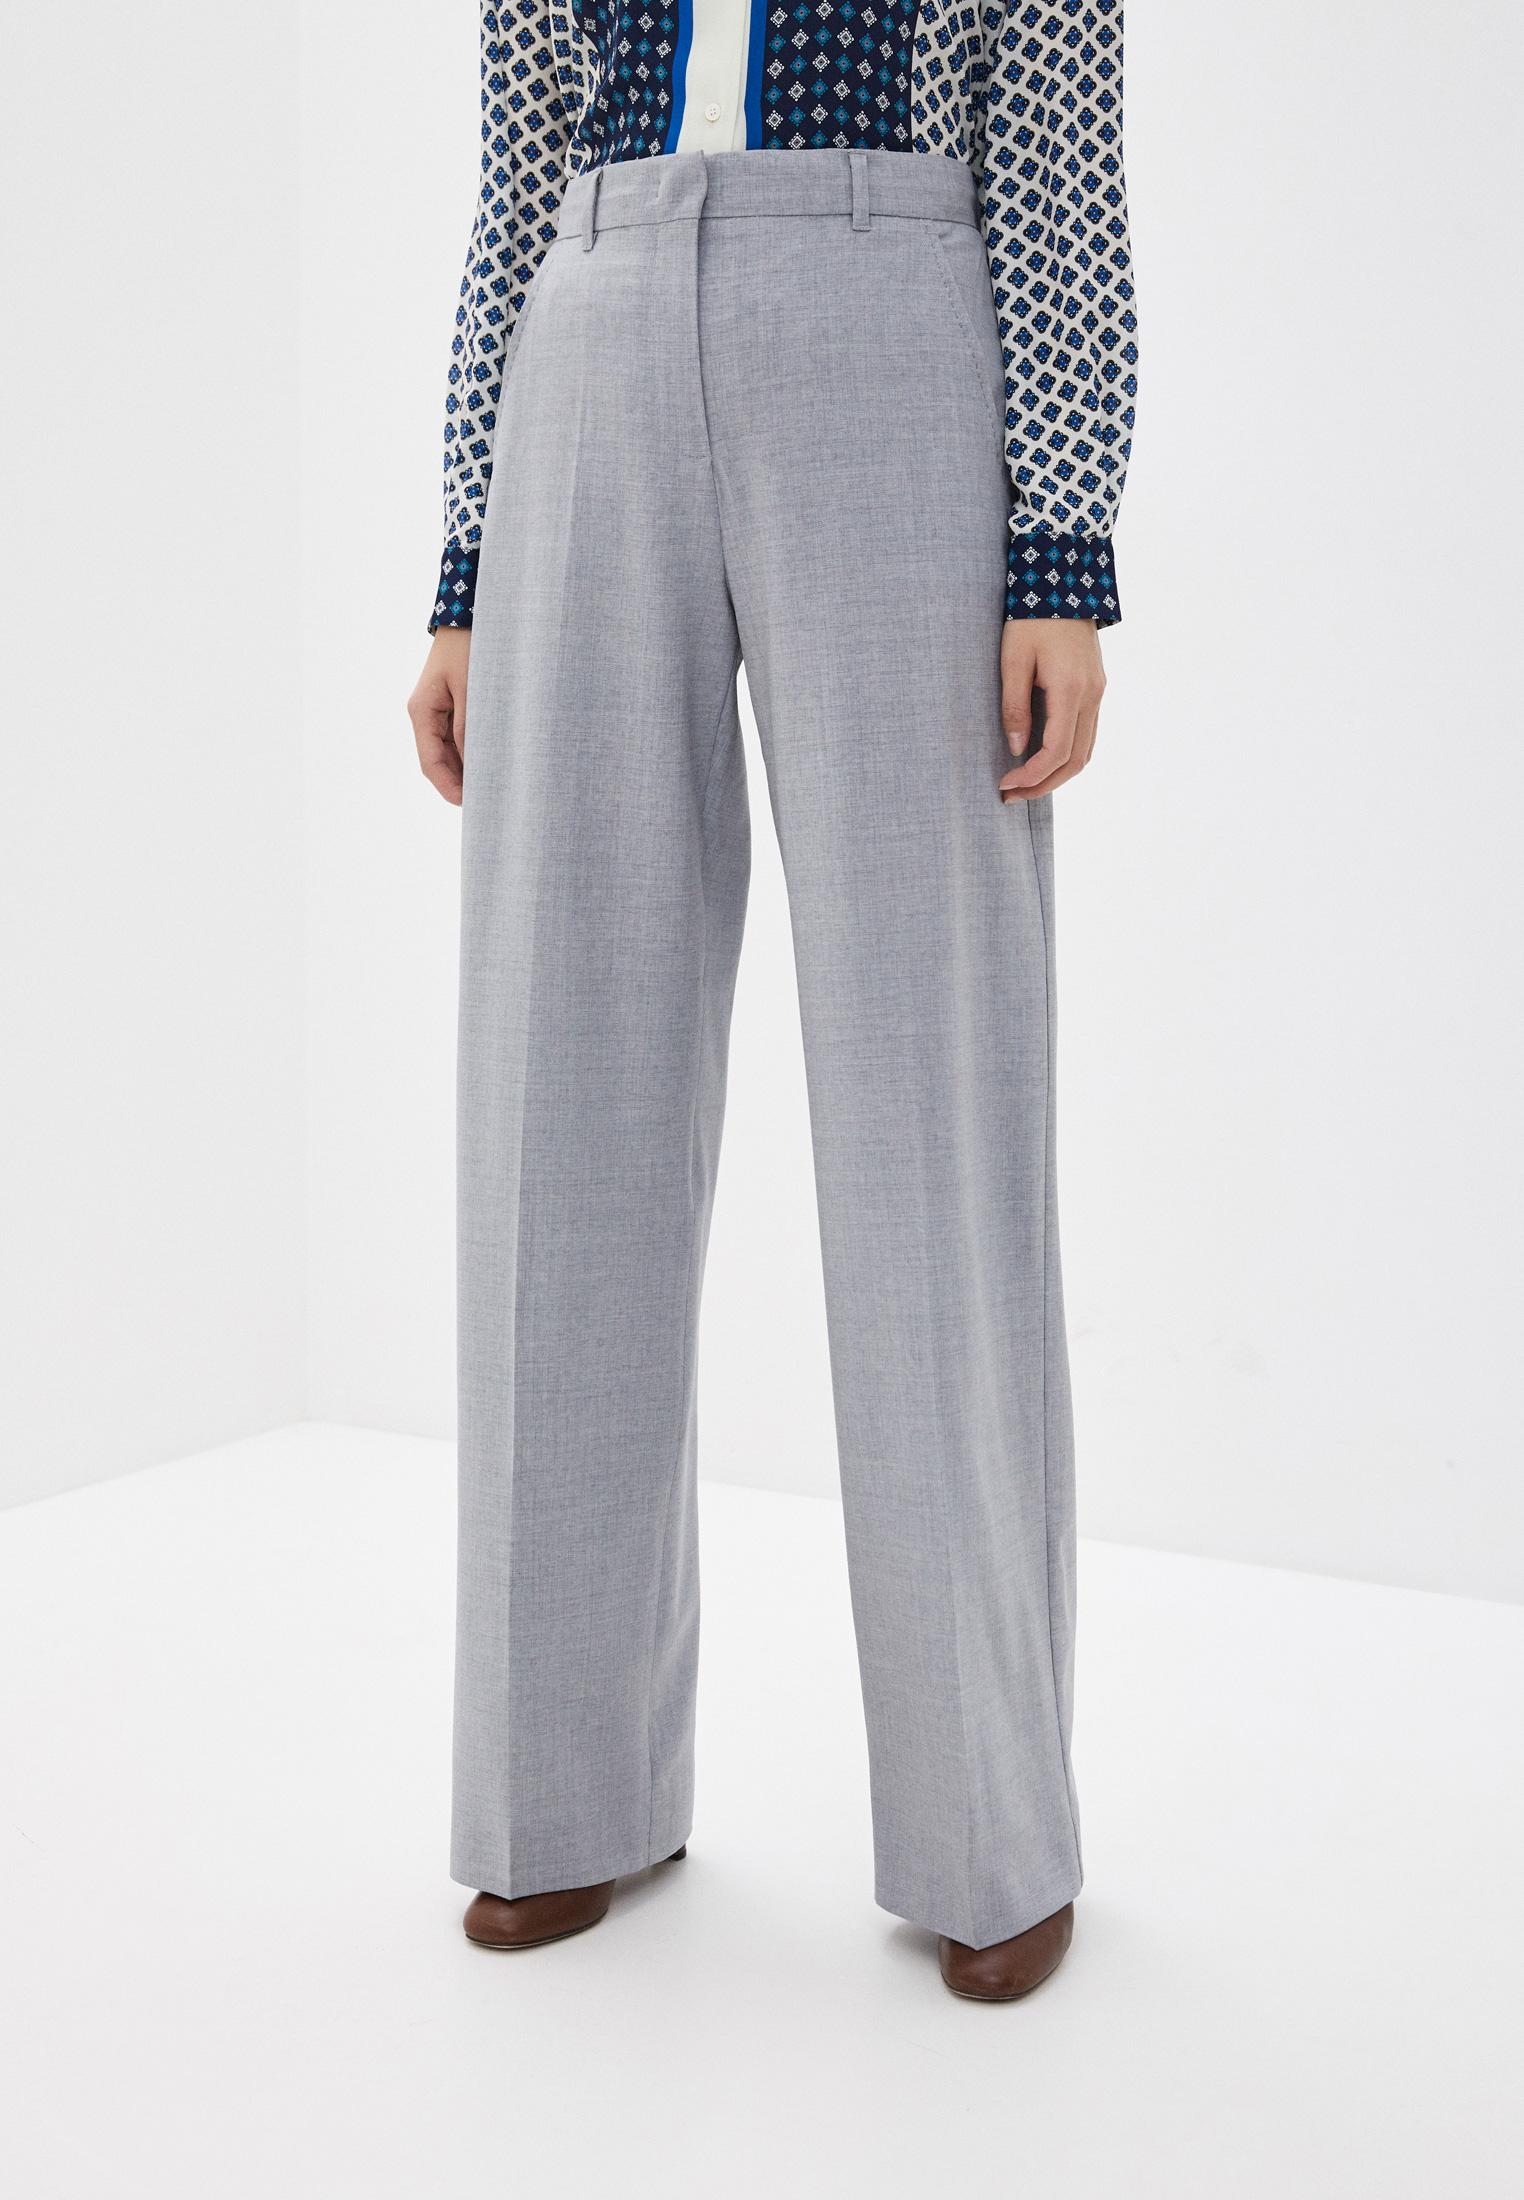 Женские классические брюки Weekend Max Mara 5131140706